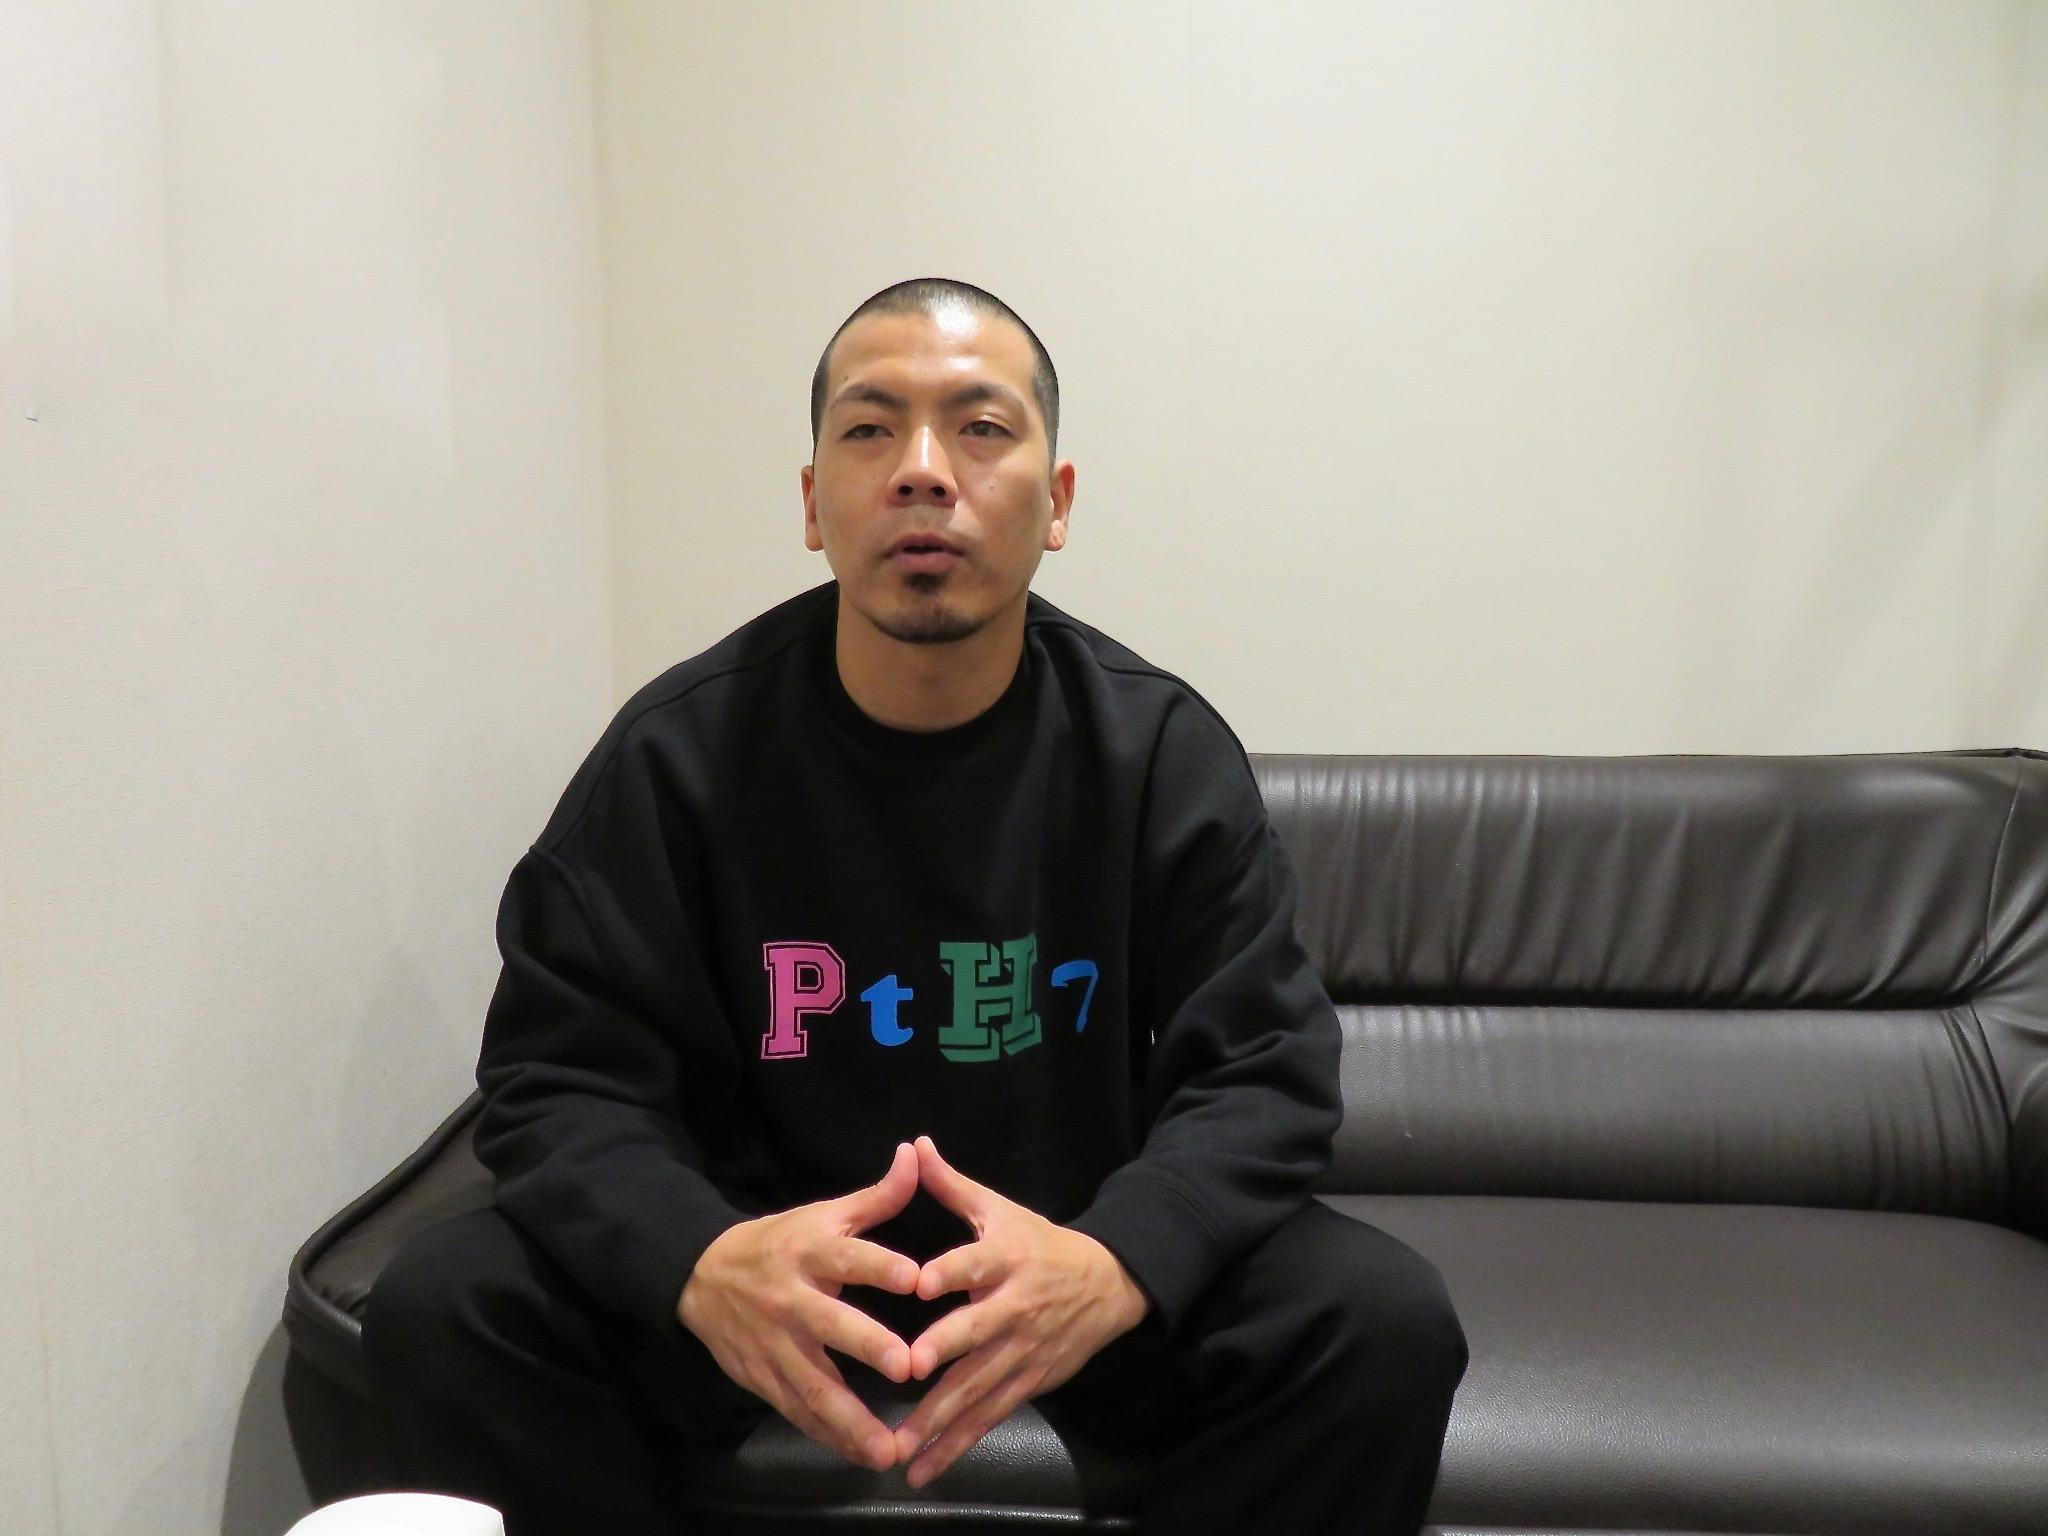 http://news.yoshimoto.co.jp/20181223175533-4afbd9da293966b35c756e2ba6b98237ab8e35ae.jpeg